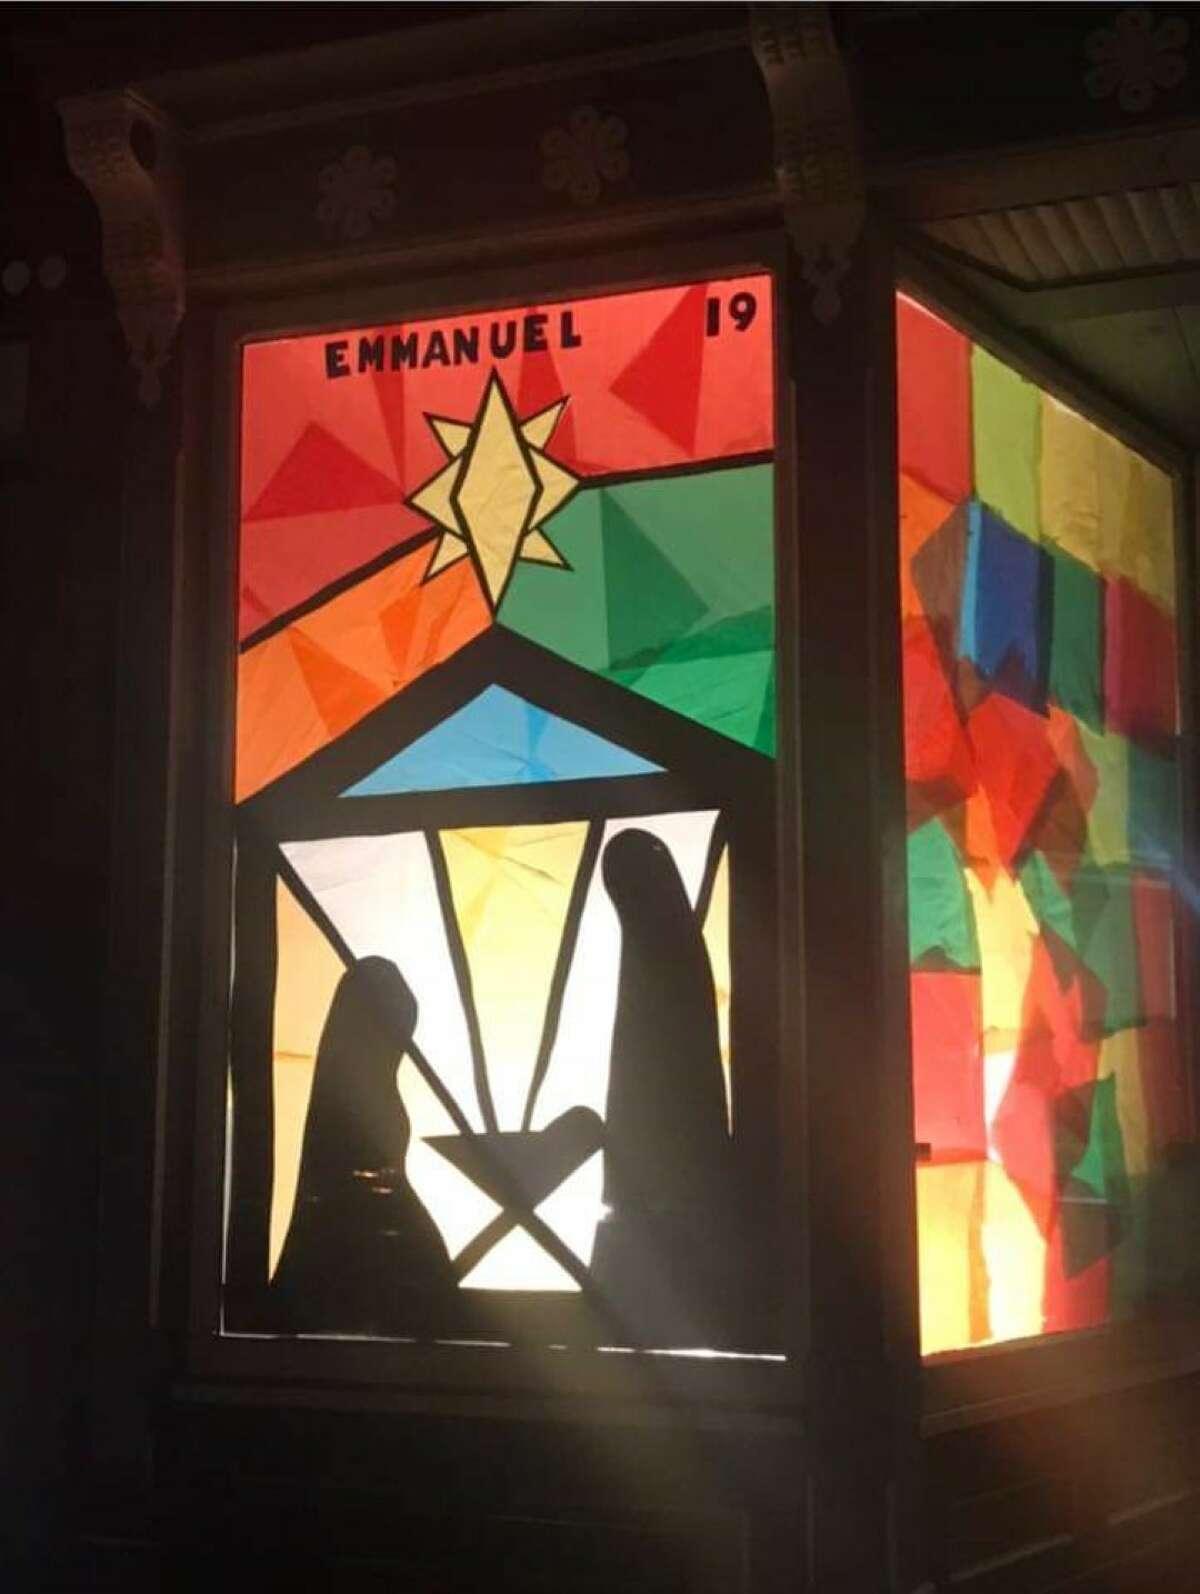 Cambridge window decorations from 2019.